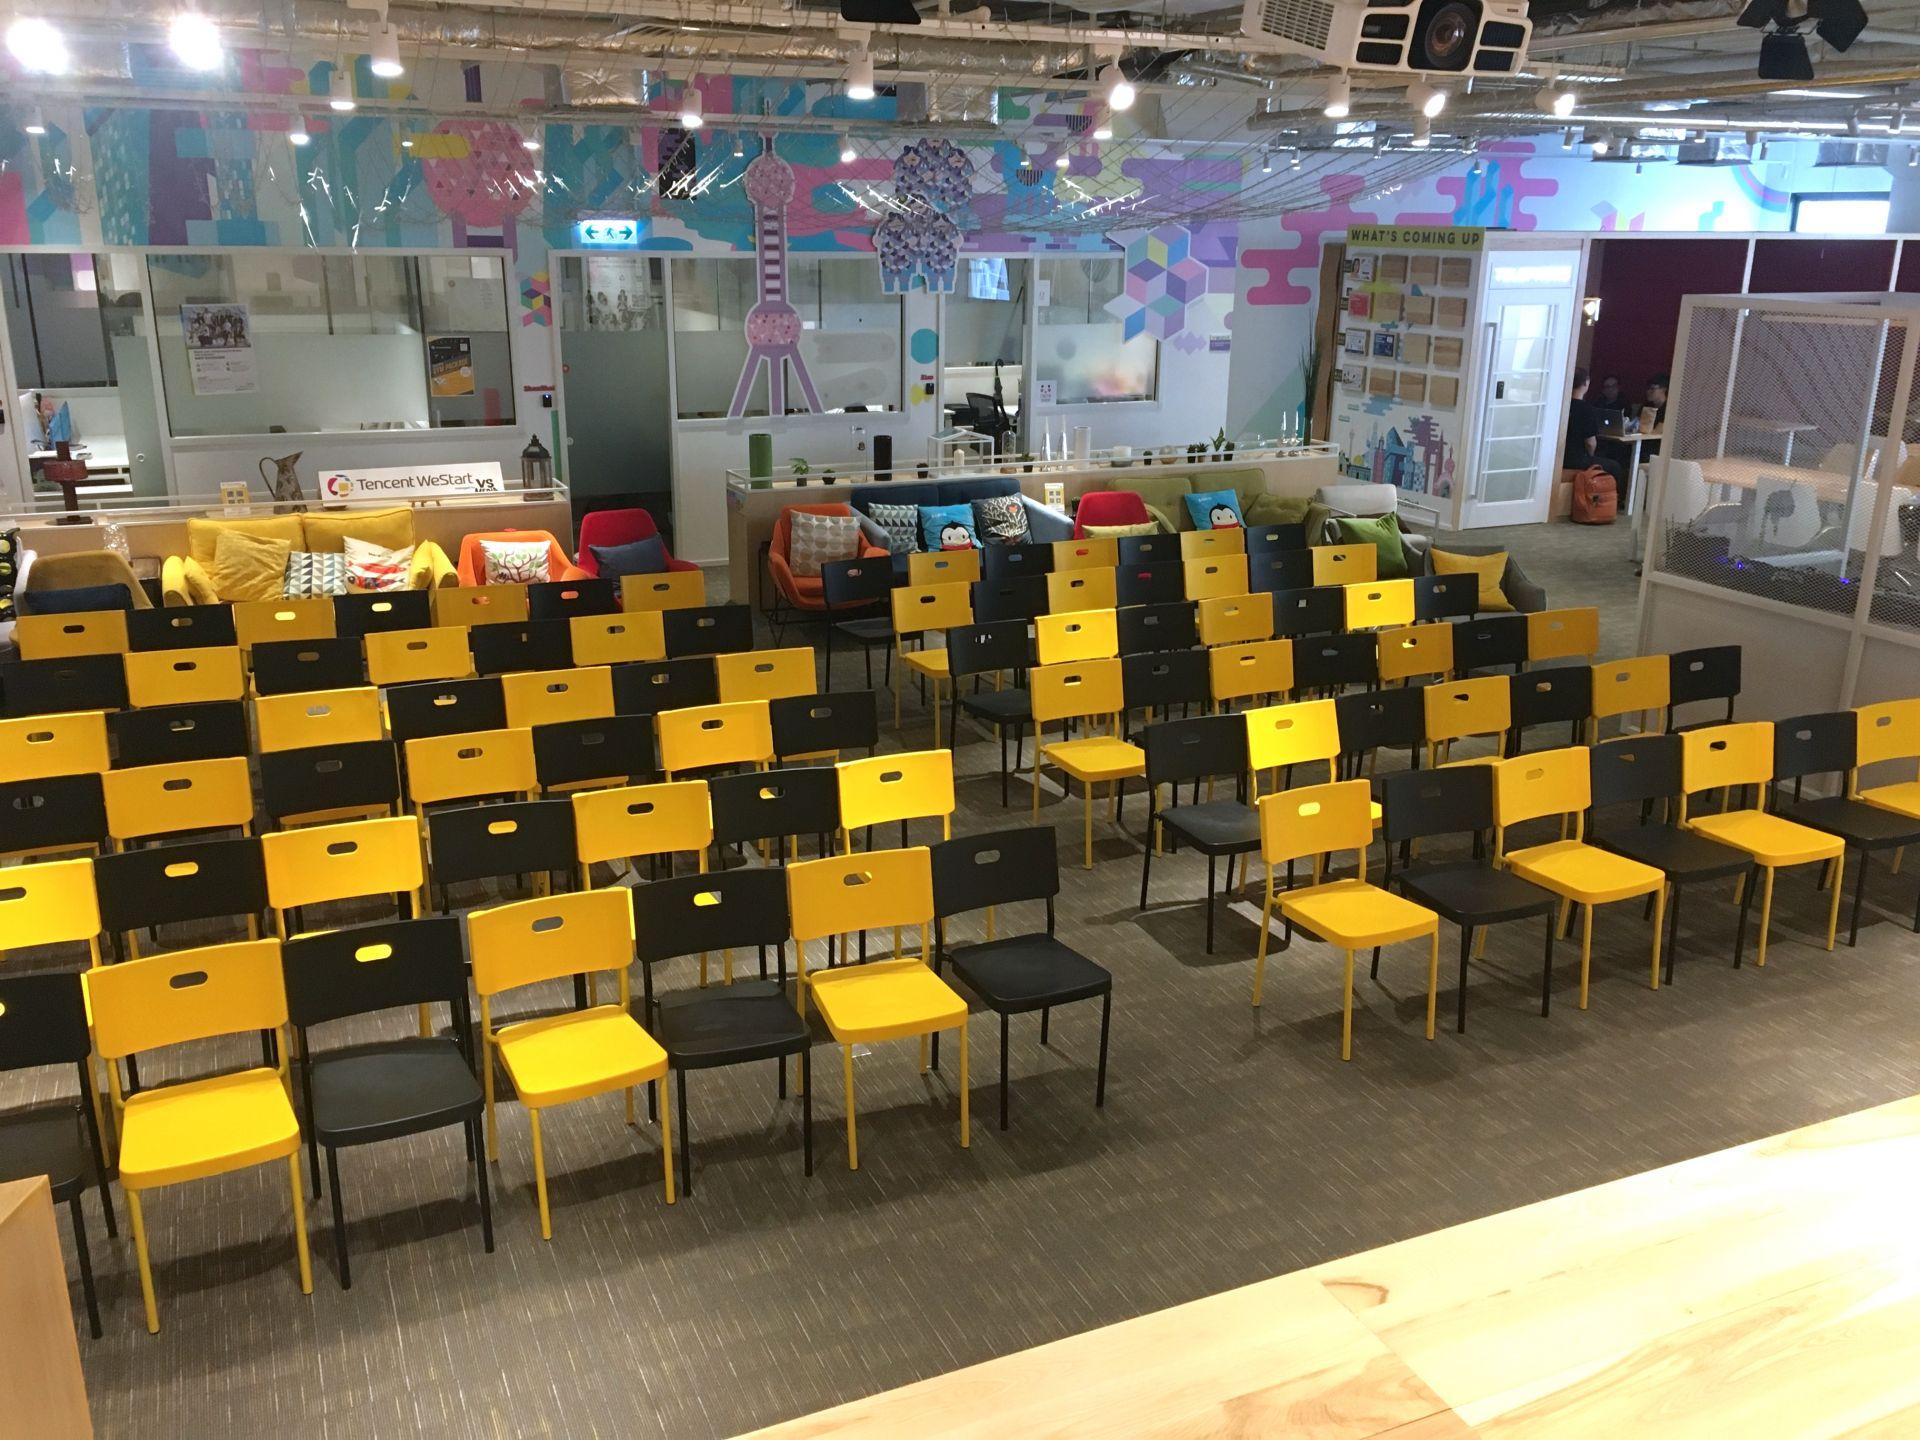 Tencent WeStart (Hong Kong), Hong Kong